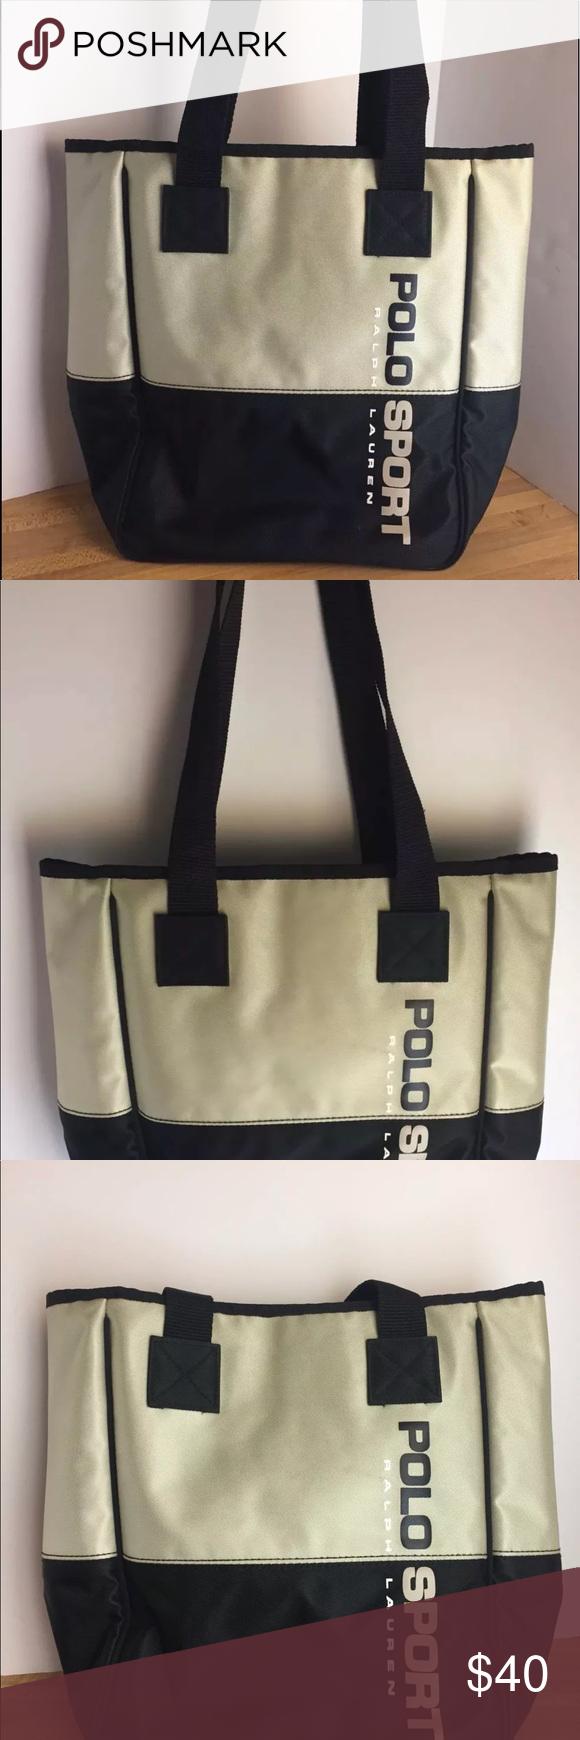 b72c3e0097 Polo Sport Ralph Lauren Messenger Shoulder Bag Polo Sport Ralph Lauren  Messenger Tote Shoulder Bag Black